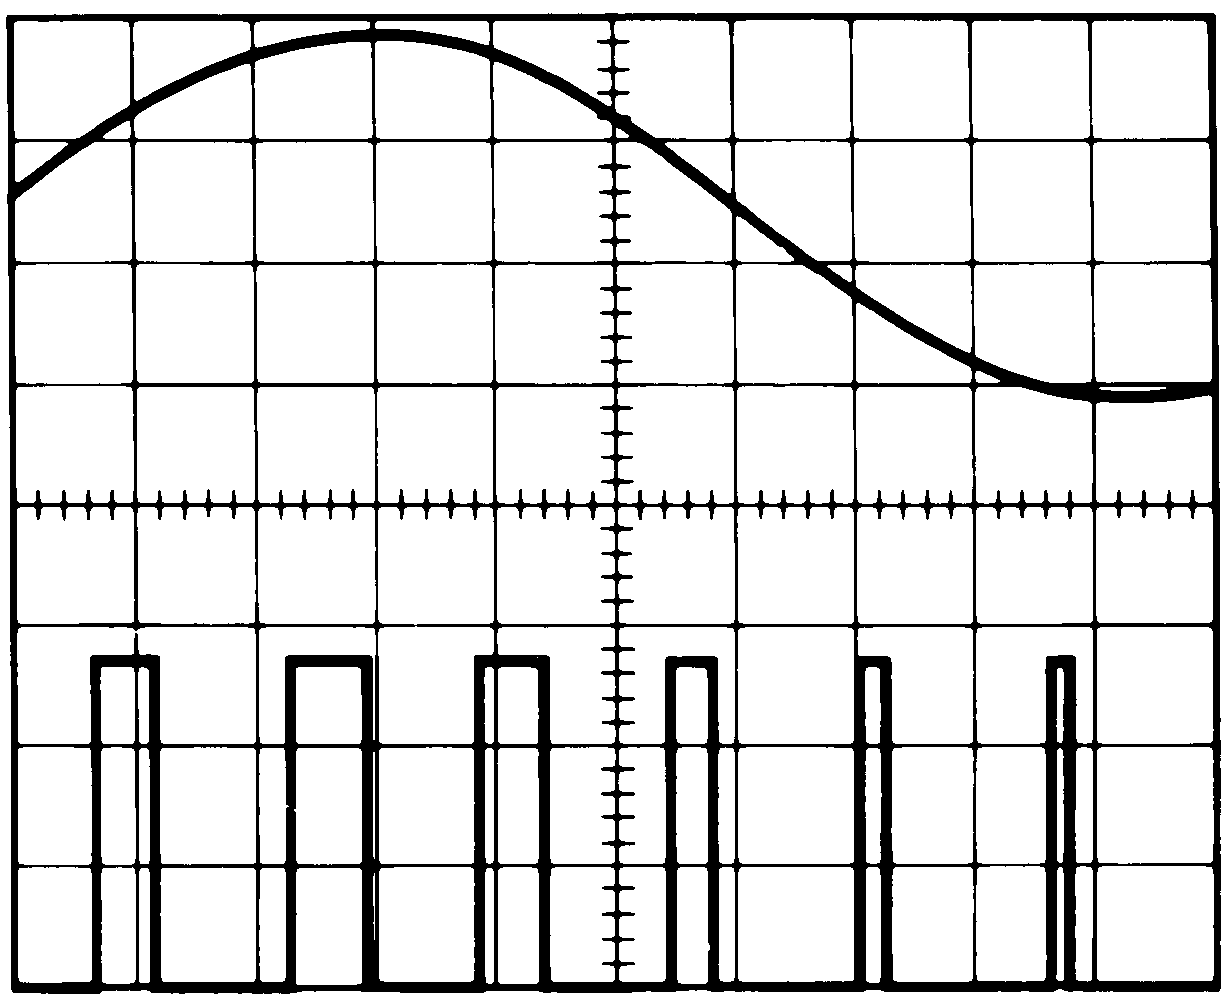 Tlc555 Q1 Pulse Width Modulation Block Diagram Modulator Waveform Top Bottom Output Voltage